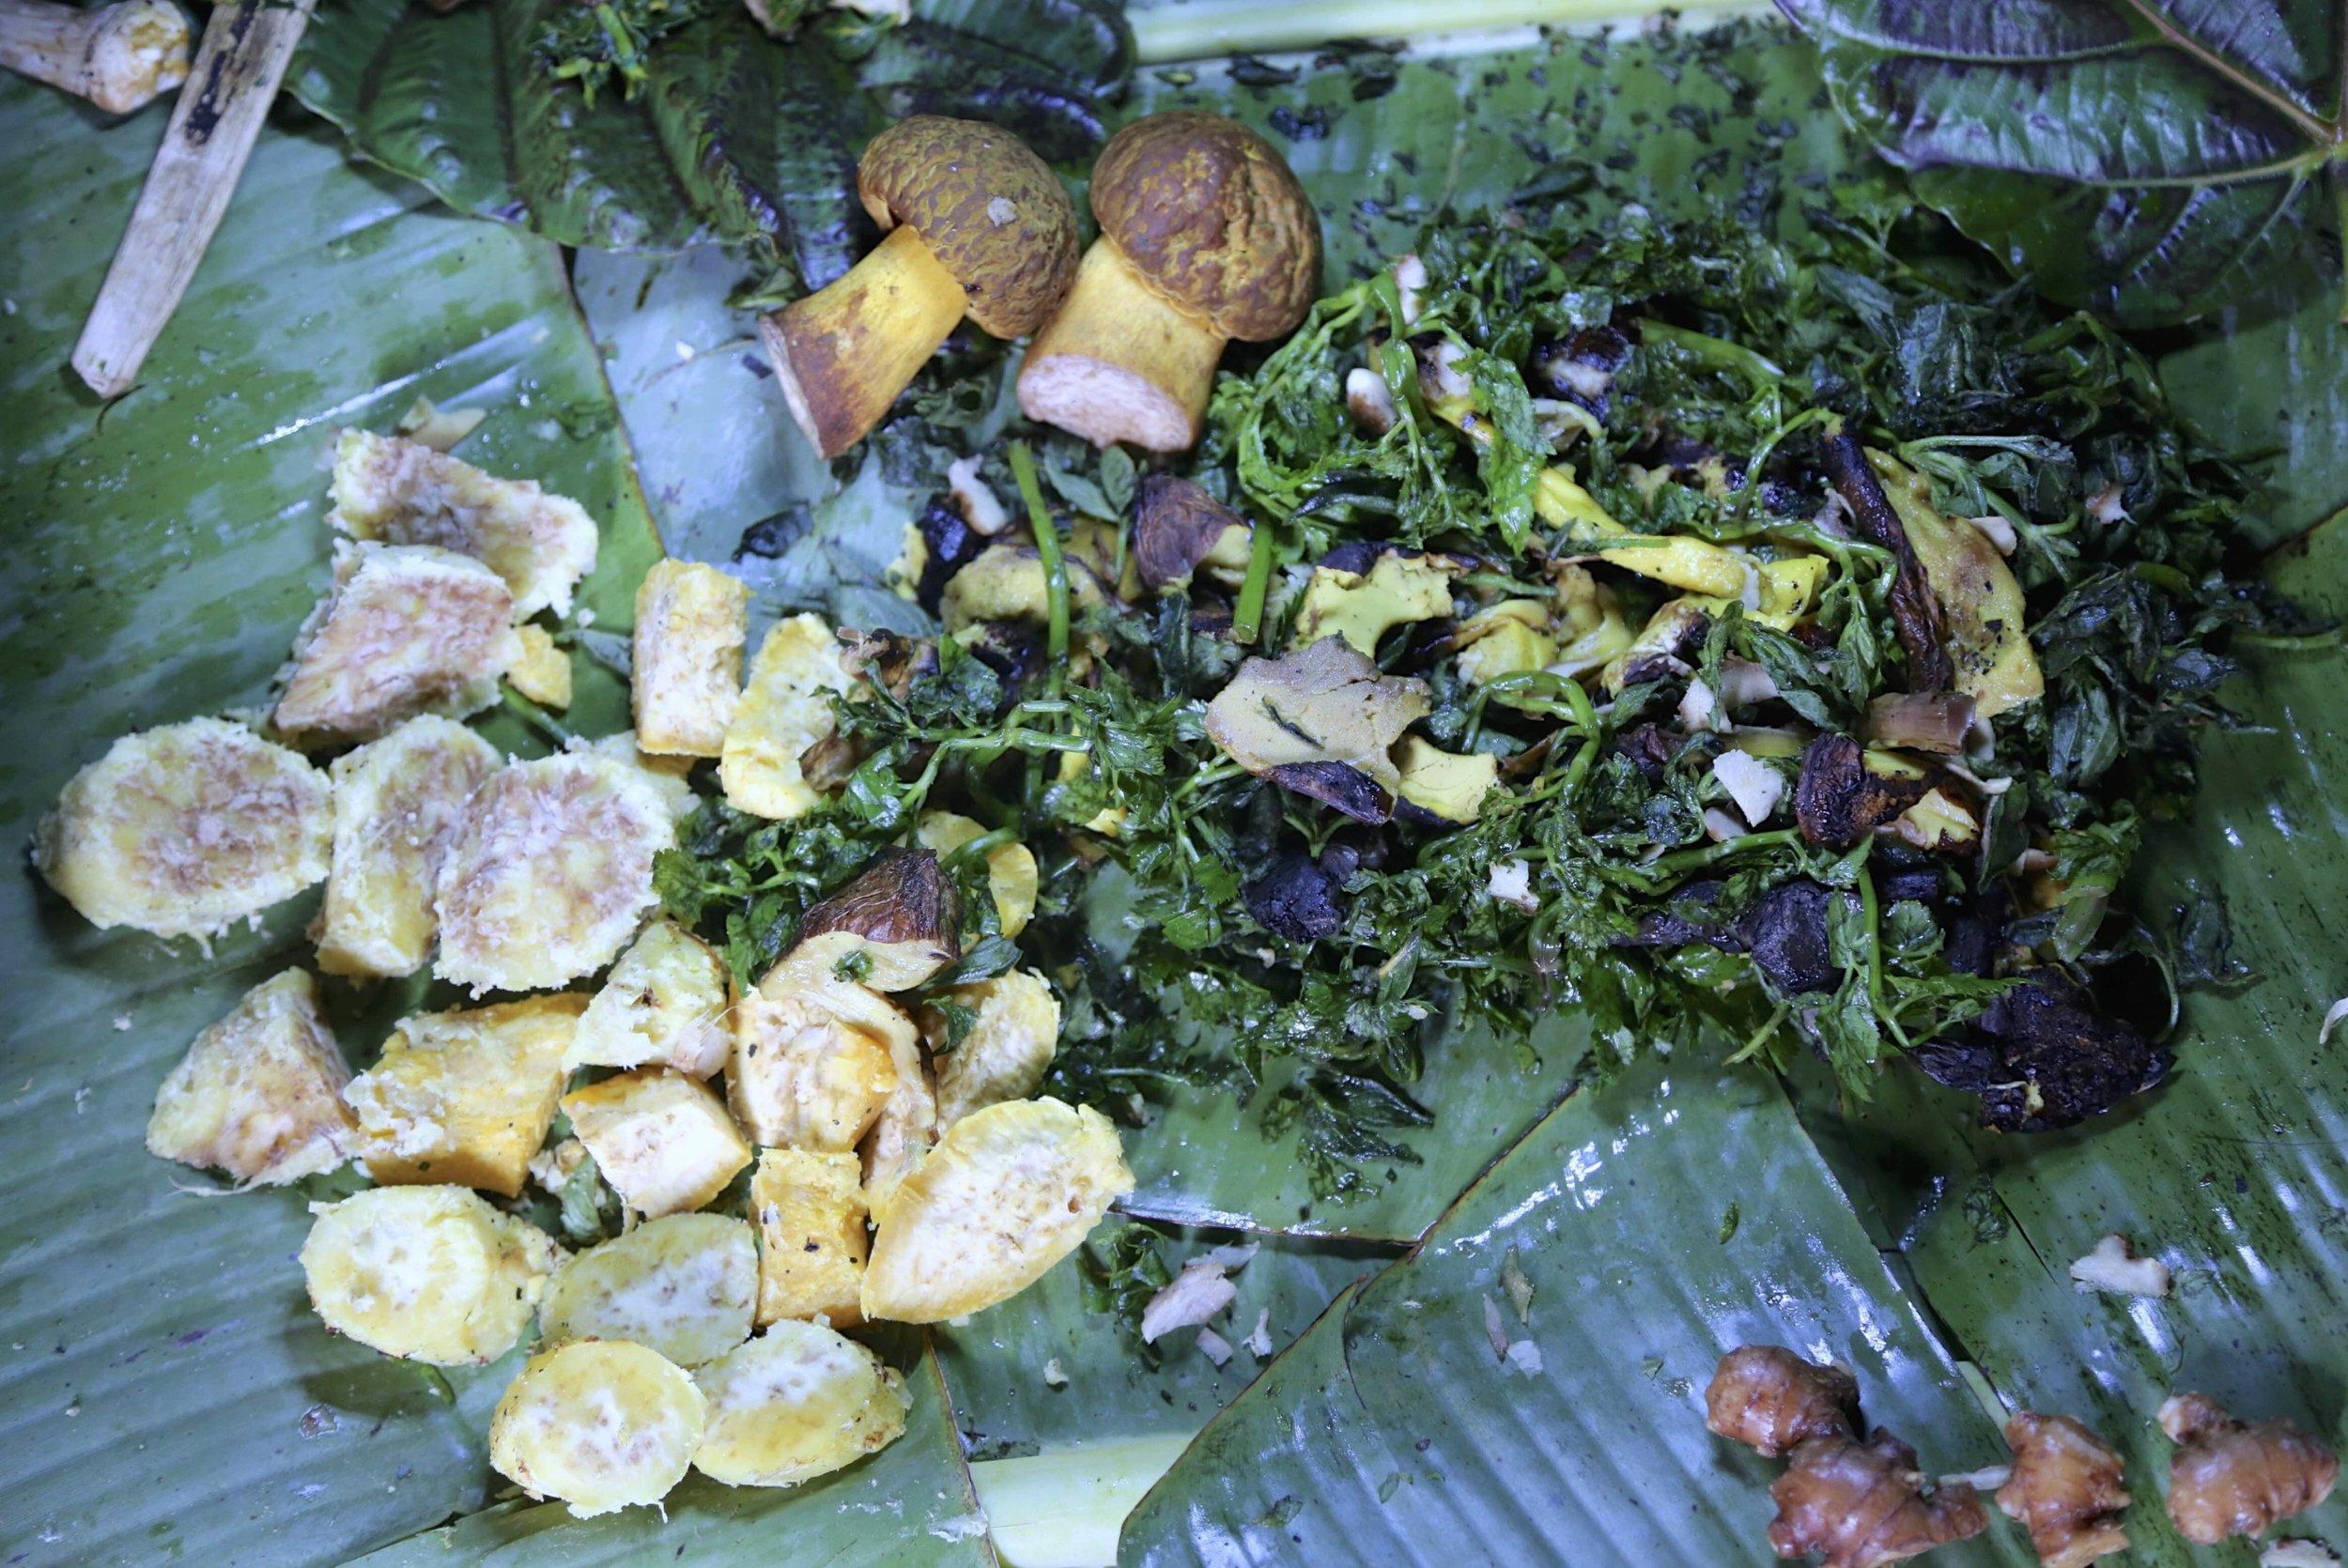 Wild mushrooms and sweet potatoes with bush ferns prepared in Solomon Islands